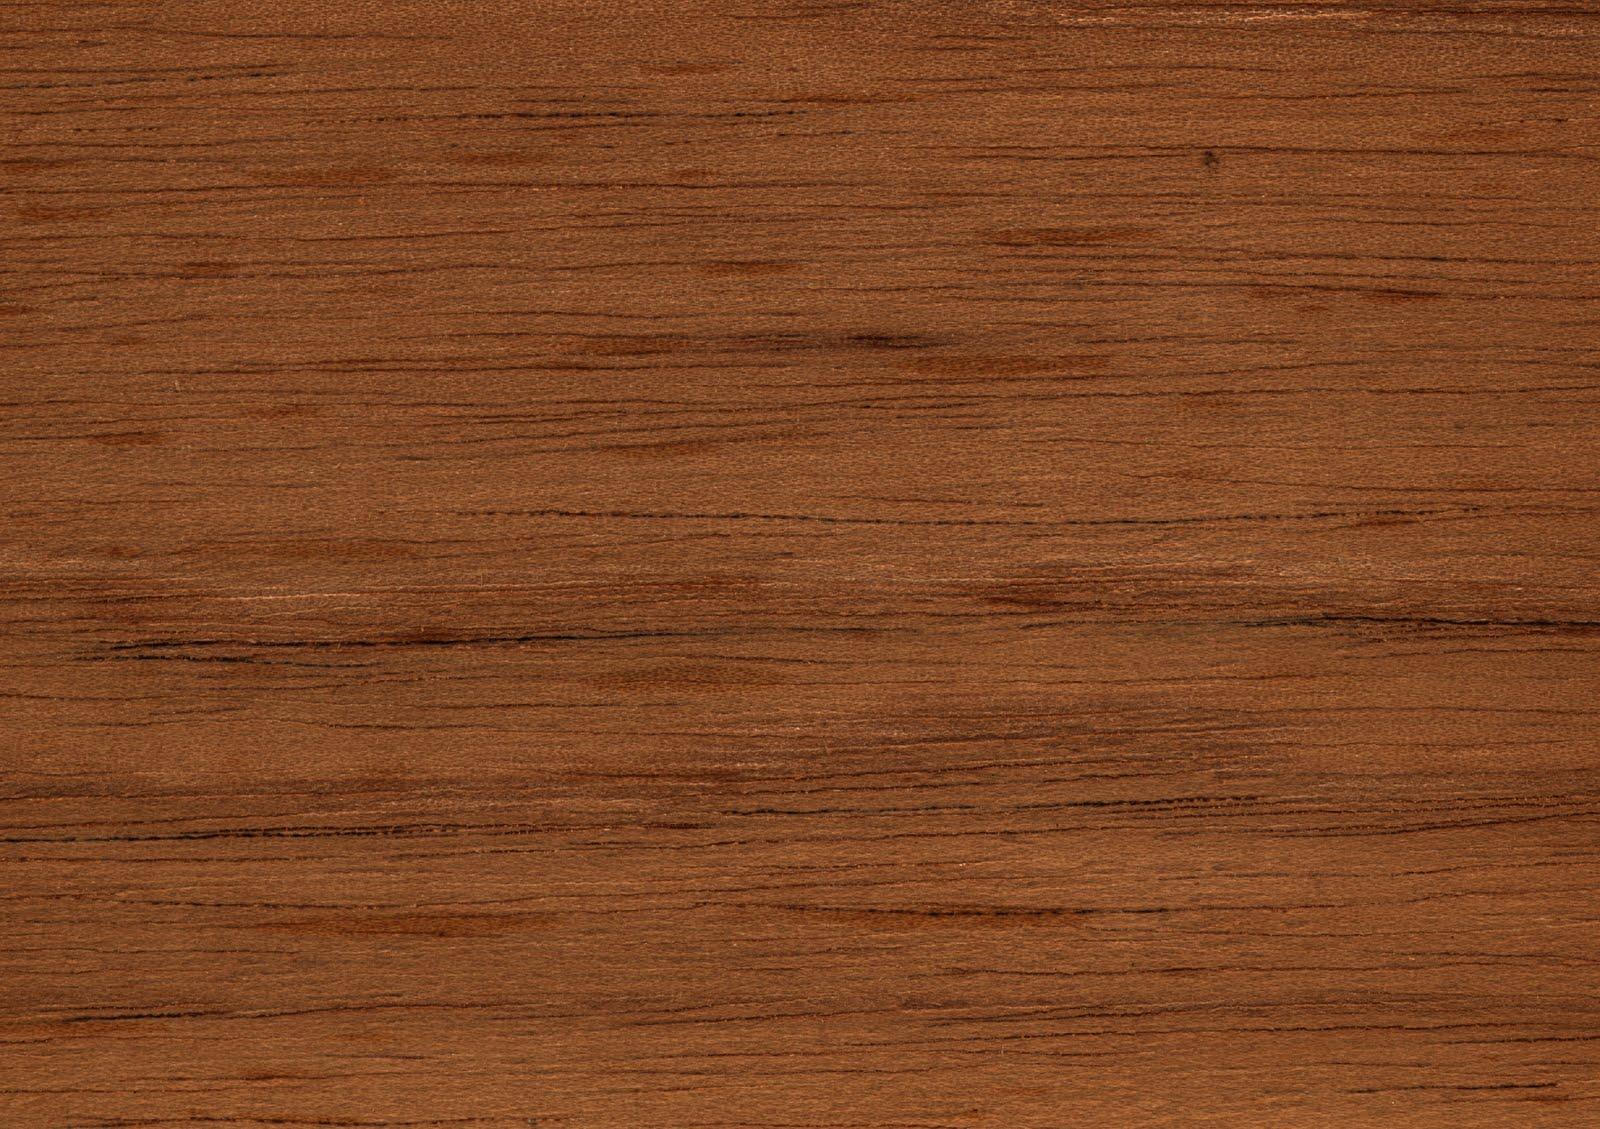 Madera de cedro americano maderea for Fotos en madera